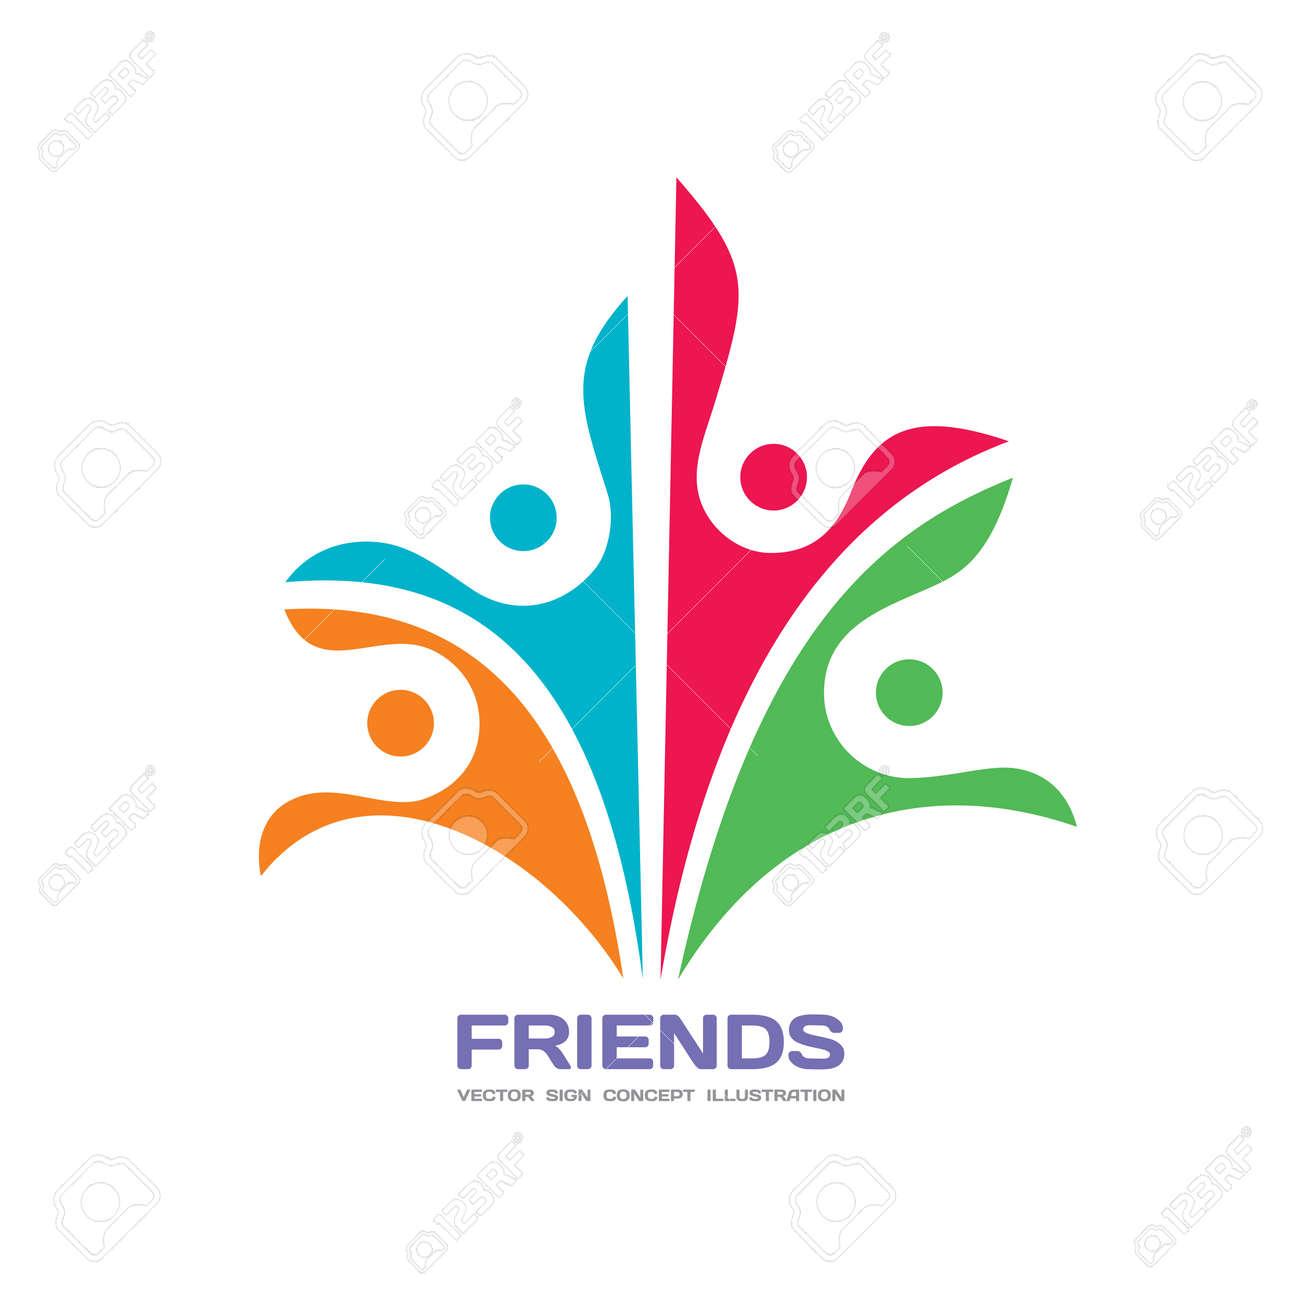 Amigos Vector Logo Plantilla Concepto Ilustración Signo Abstracto